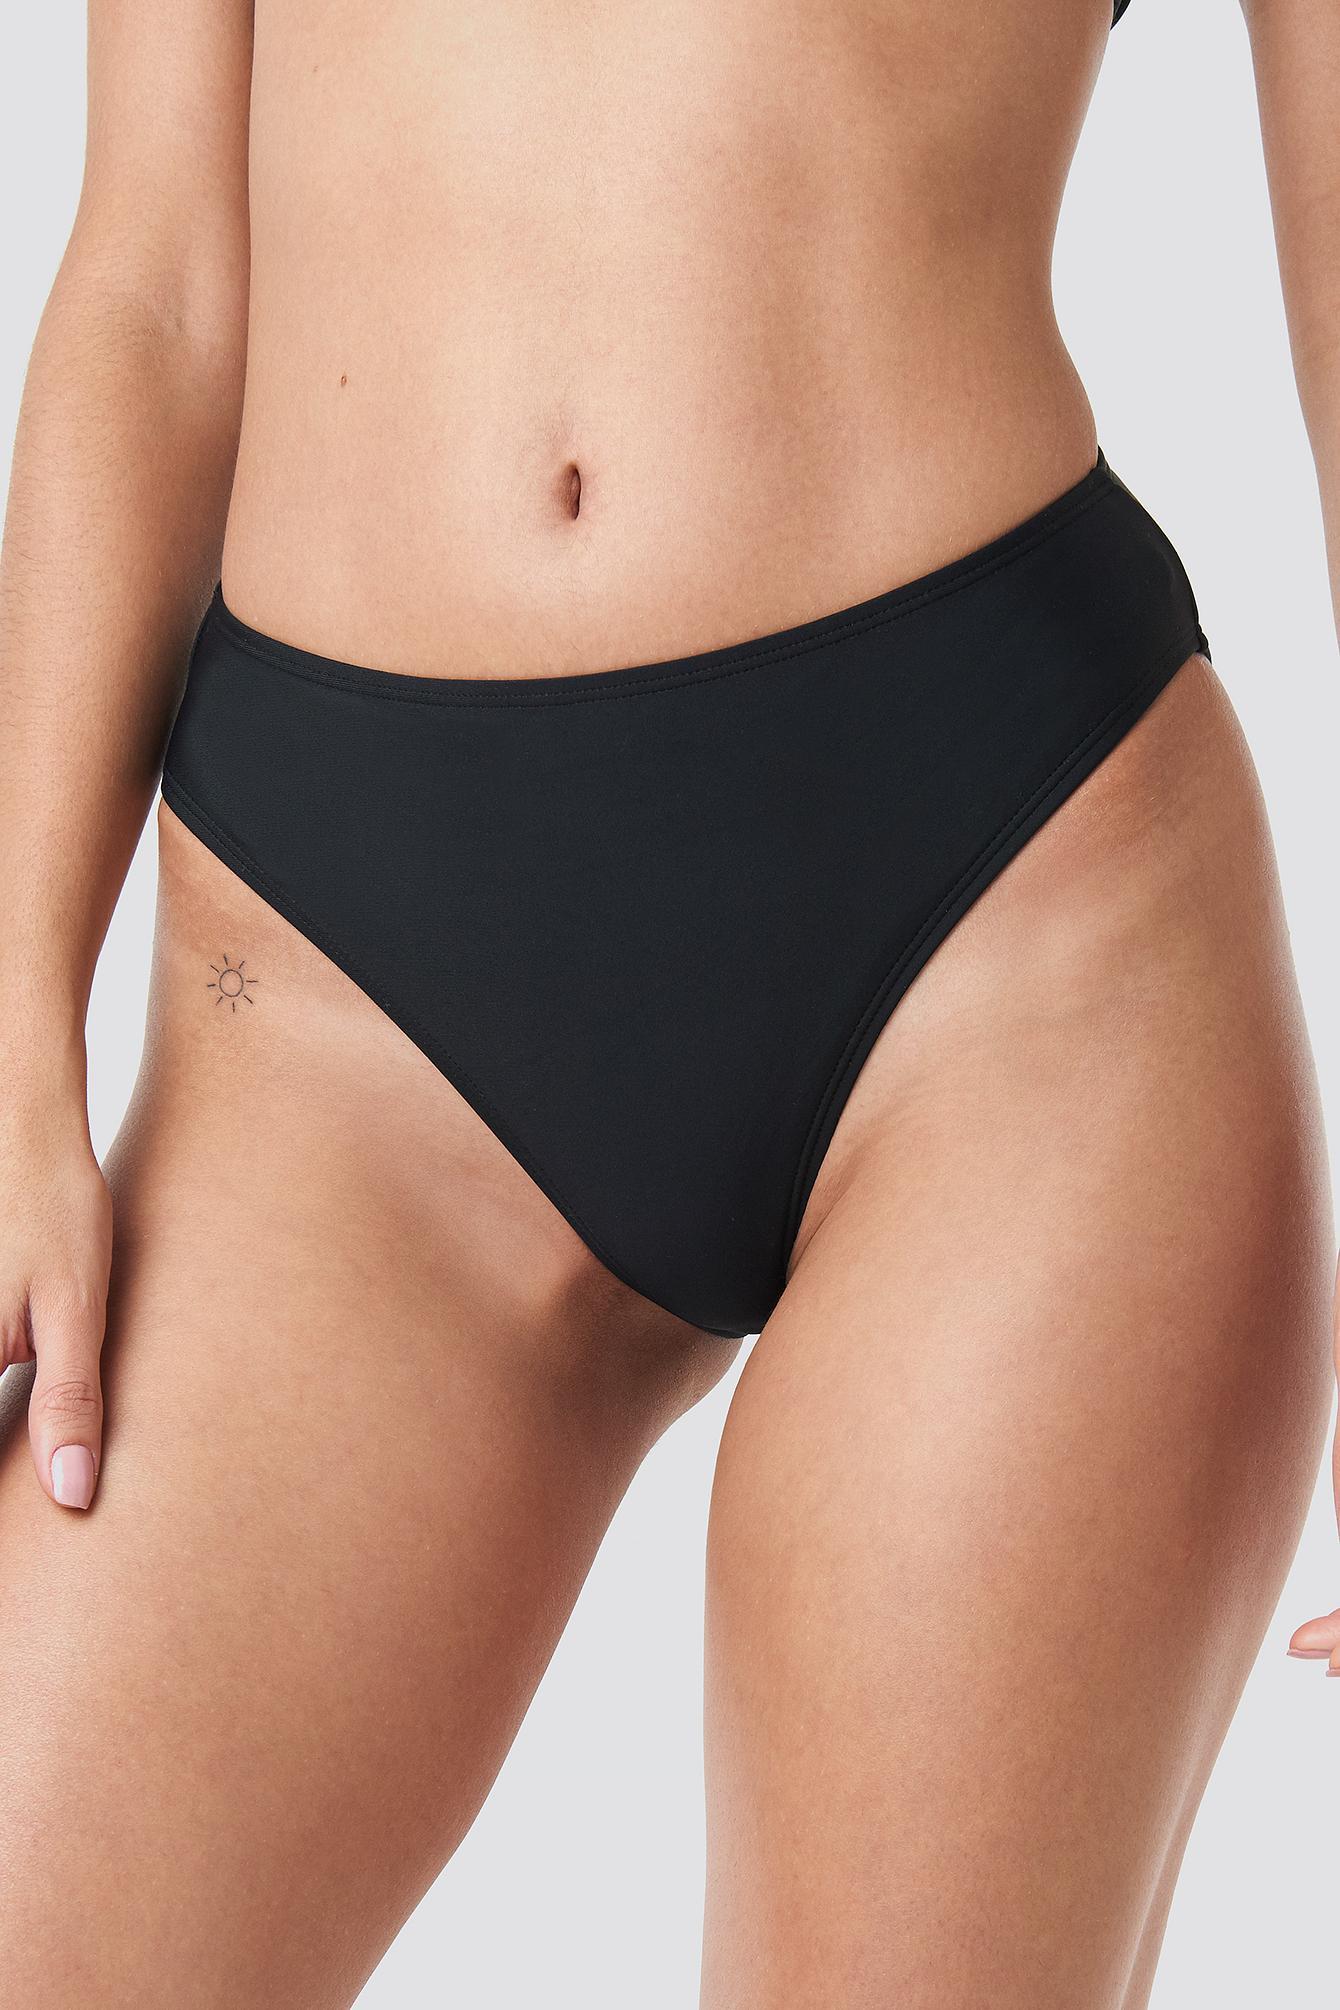 2fb99d0e568 ... High Waist Bikini Panty Black - Lyst. View fullscreen